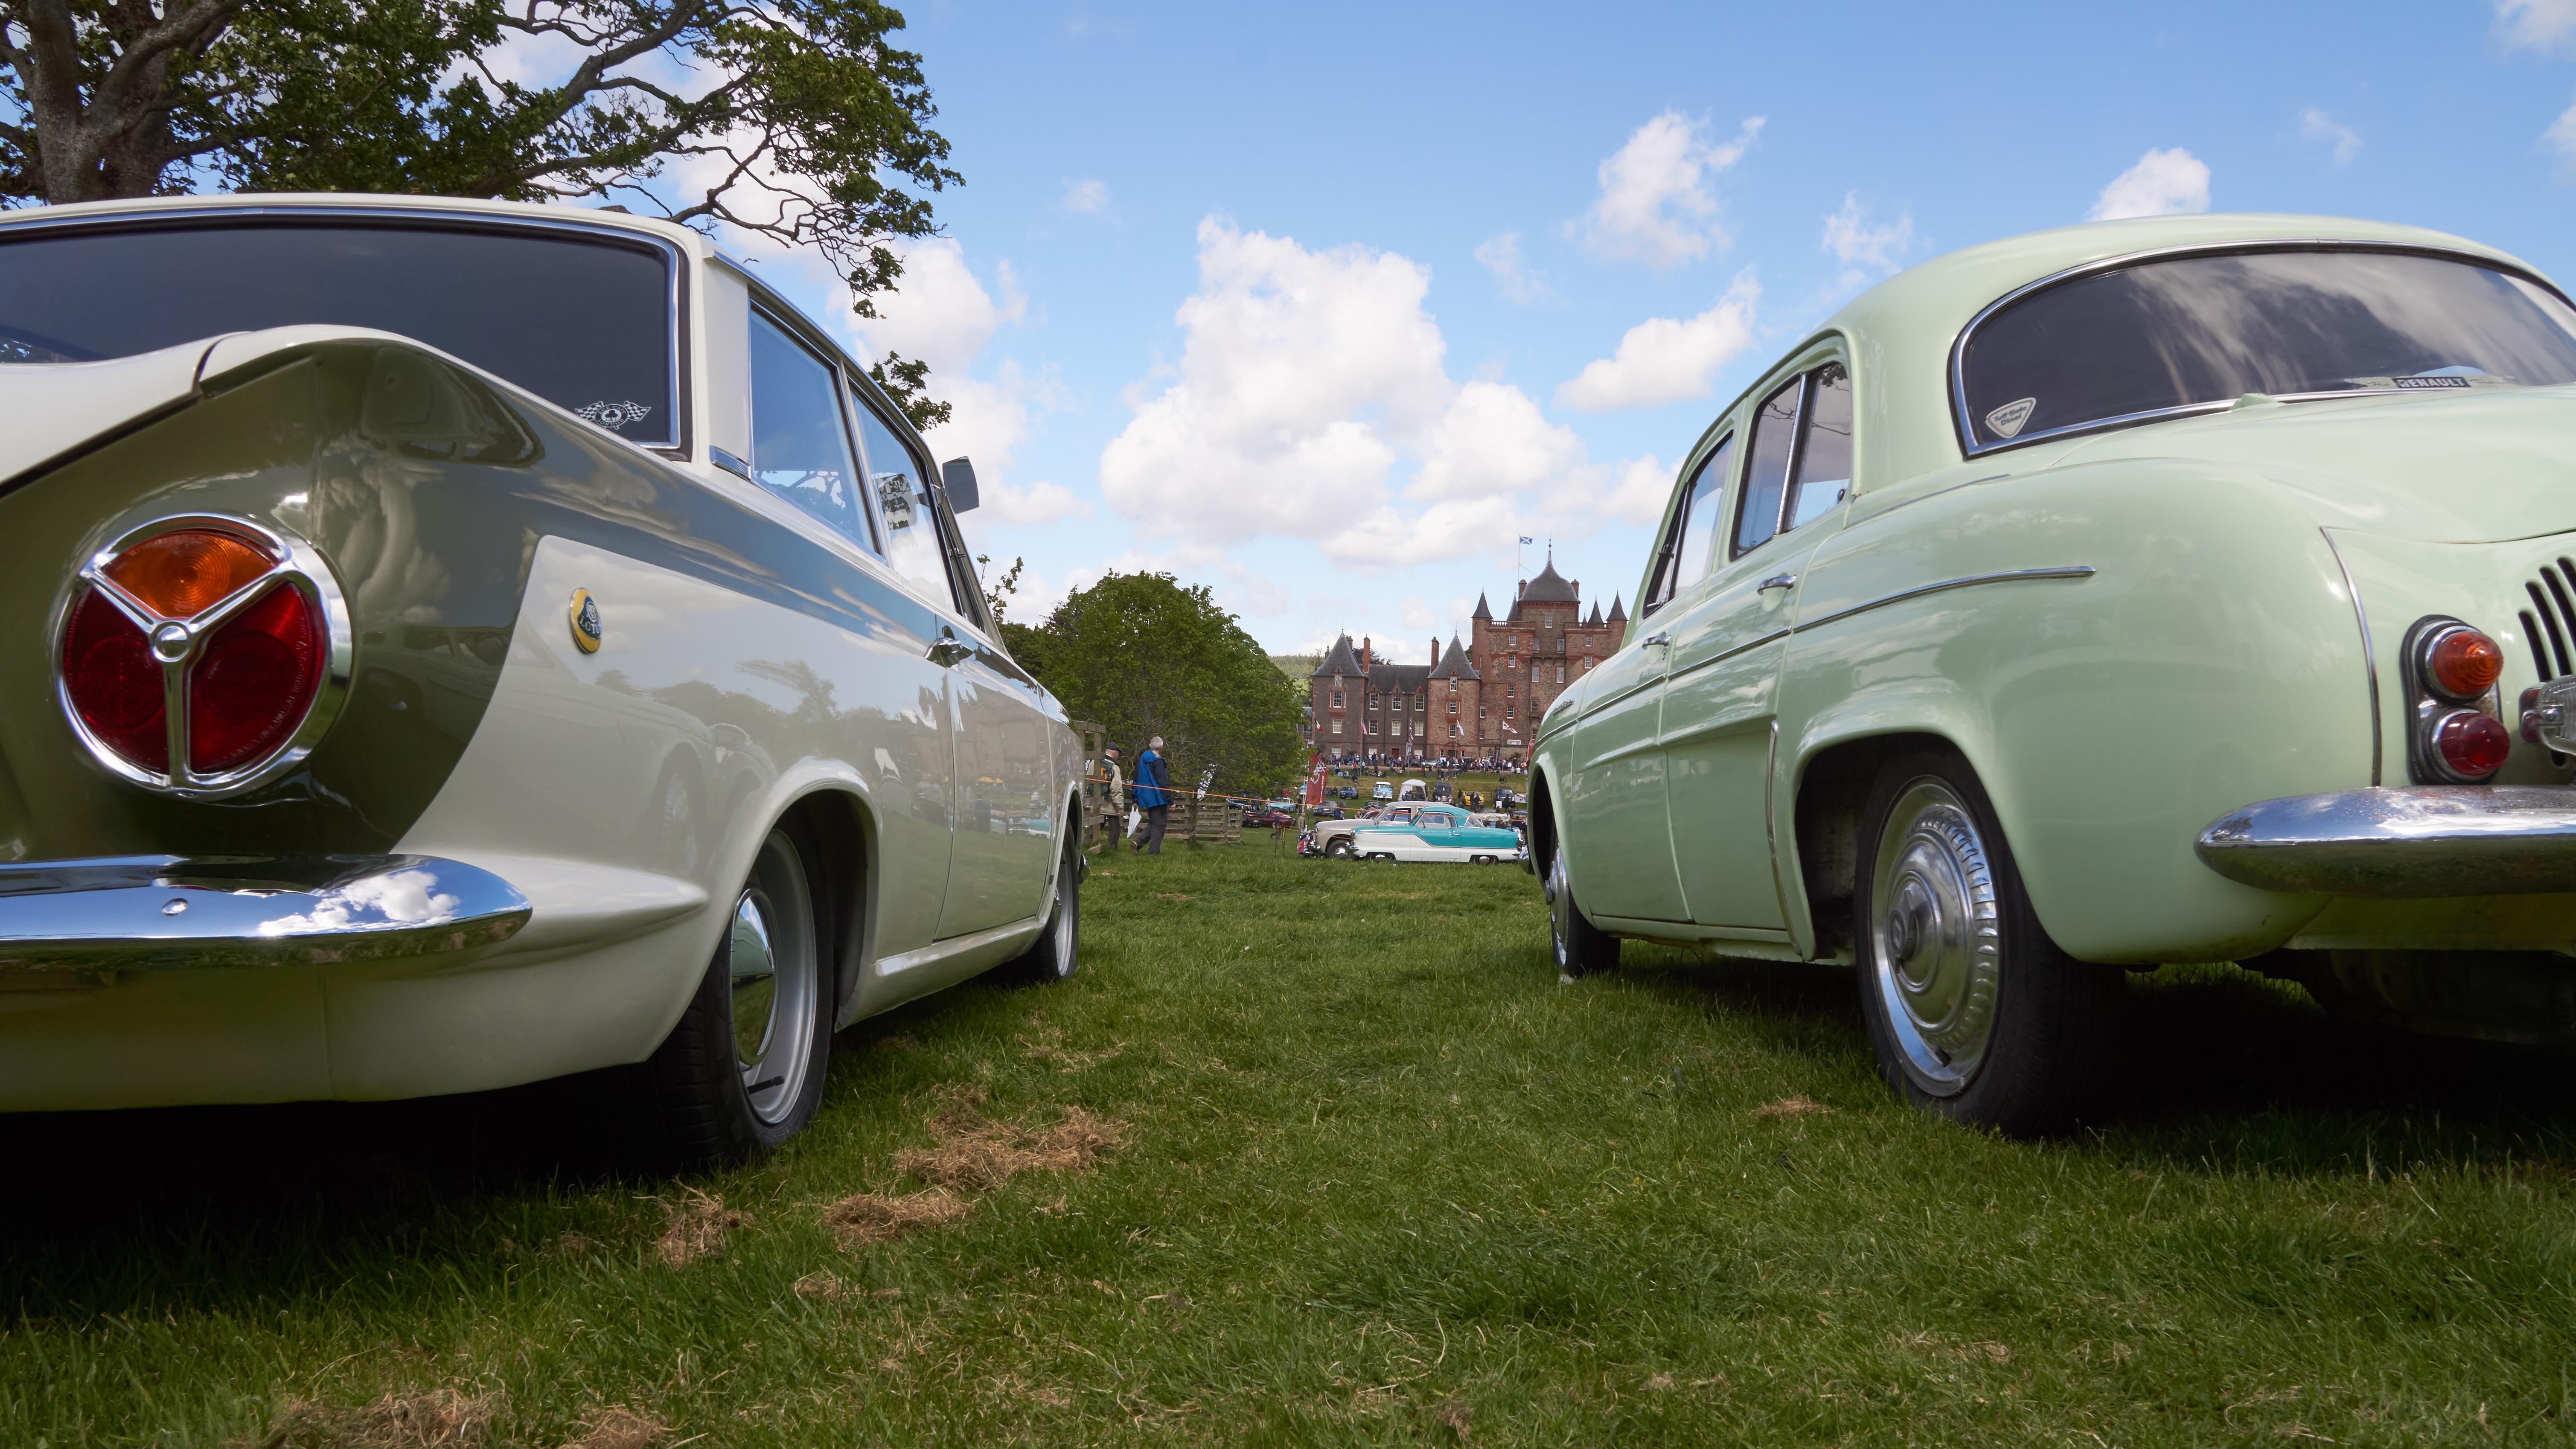 Lotus Cortina, Renault Dauphine and Nash Metropolitan, Car, Outdoor, Thirlestane, Tire, HQ Photo